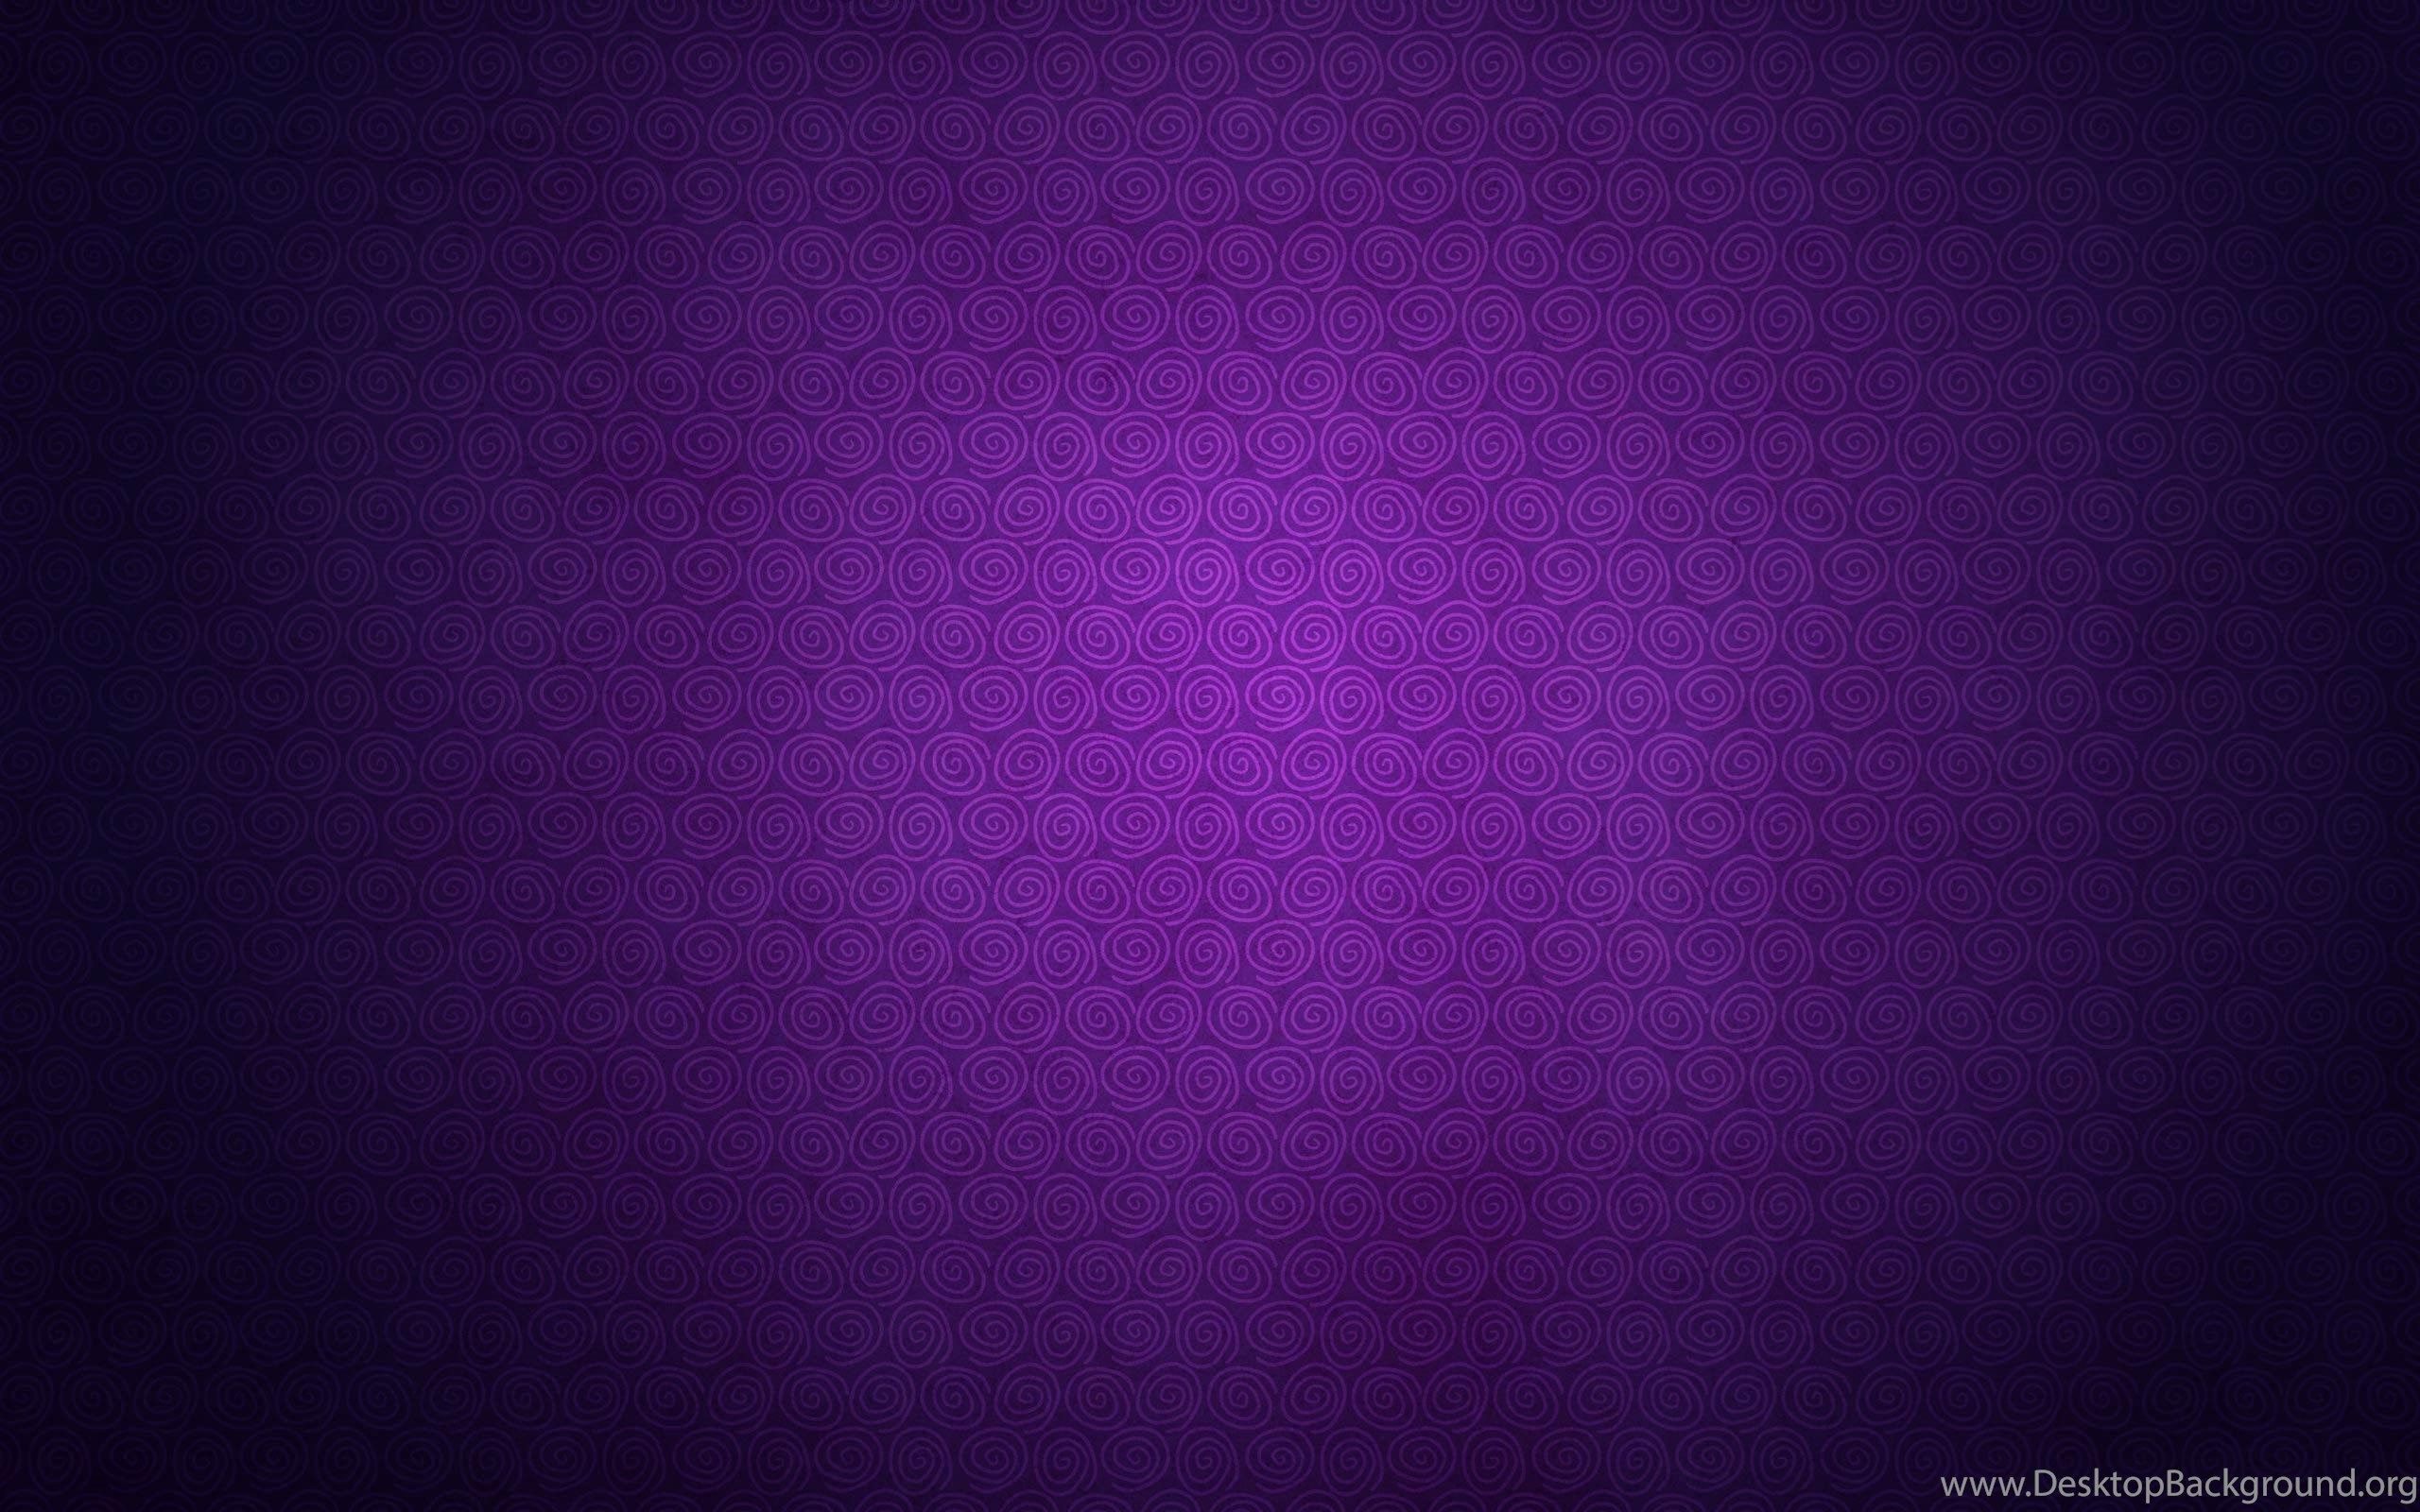 purple windows background - Monza berglauf-verband com